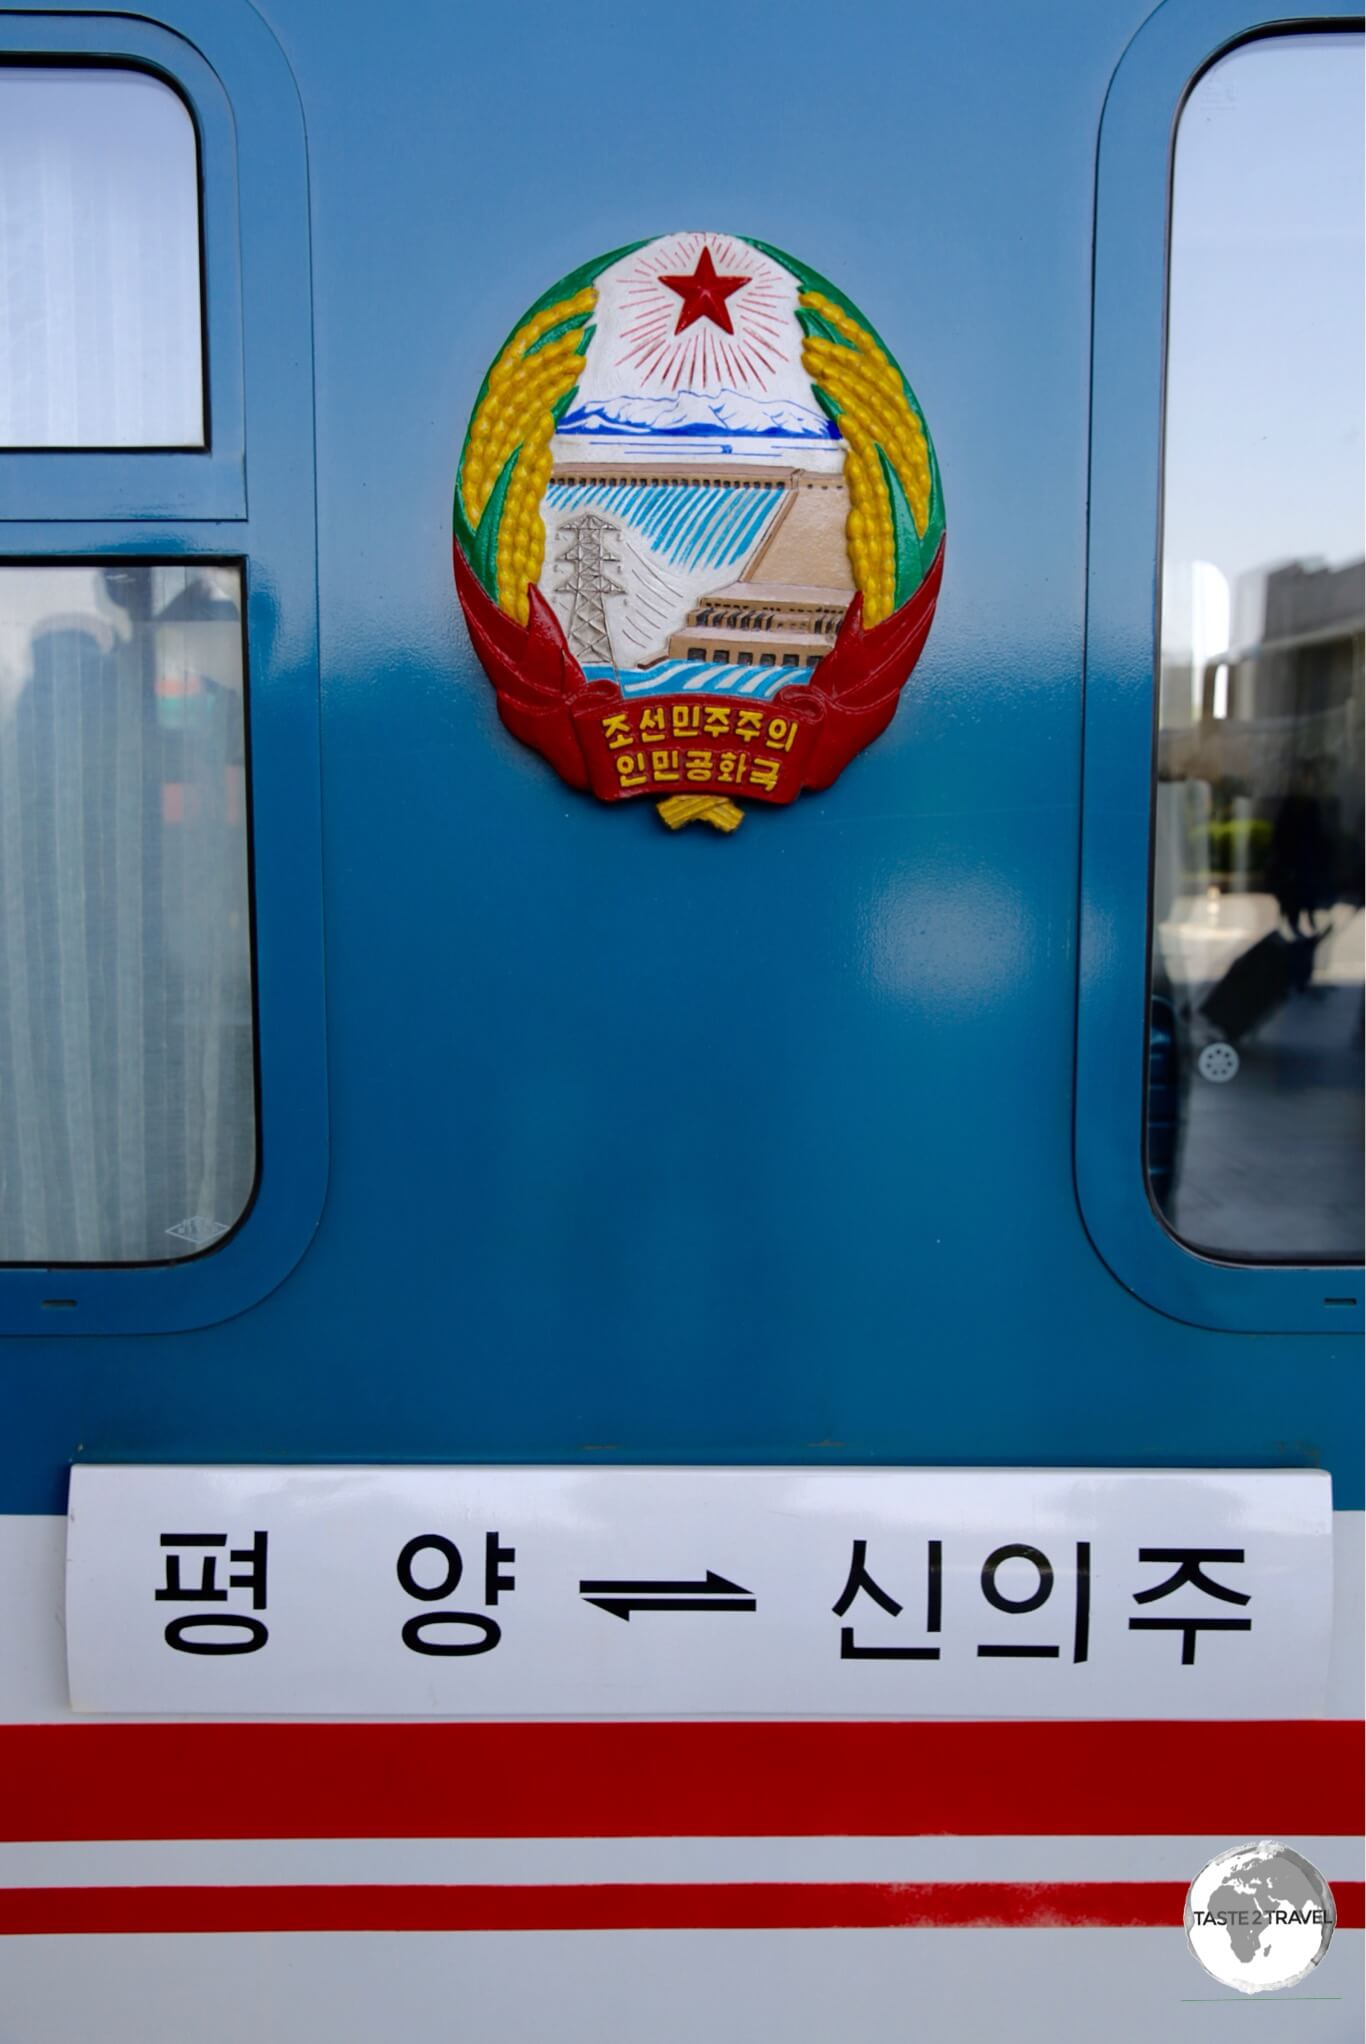 The North Korean Railways train from Sinuiju to Pyongyang.